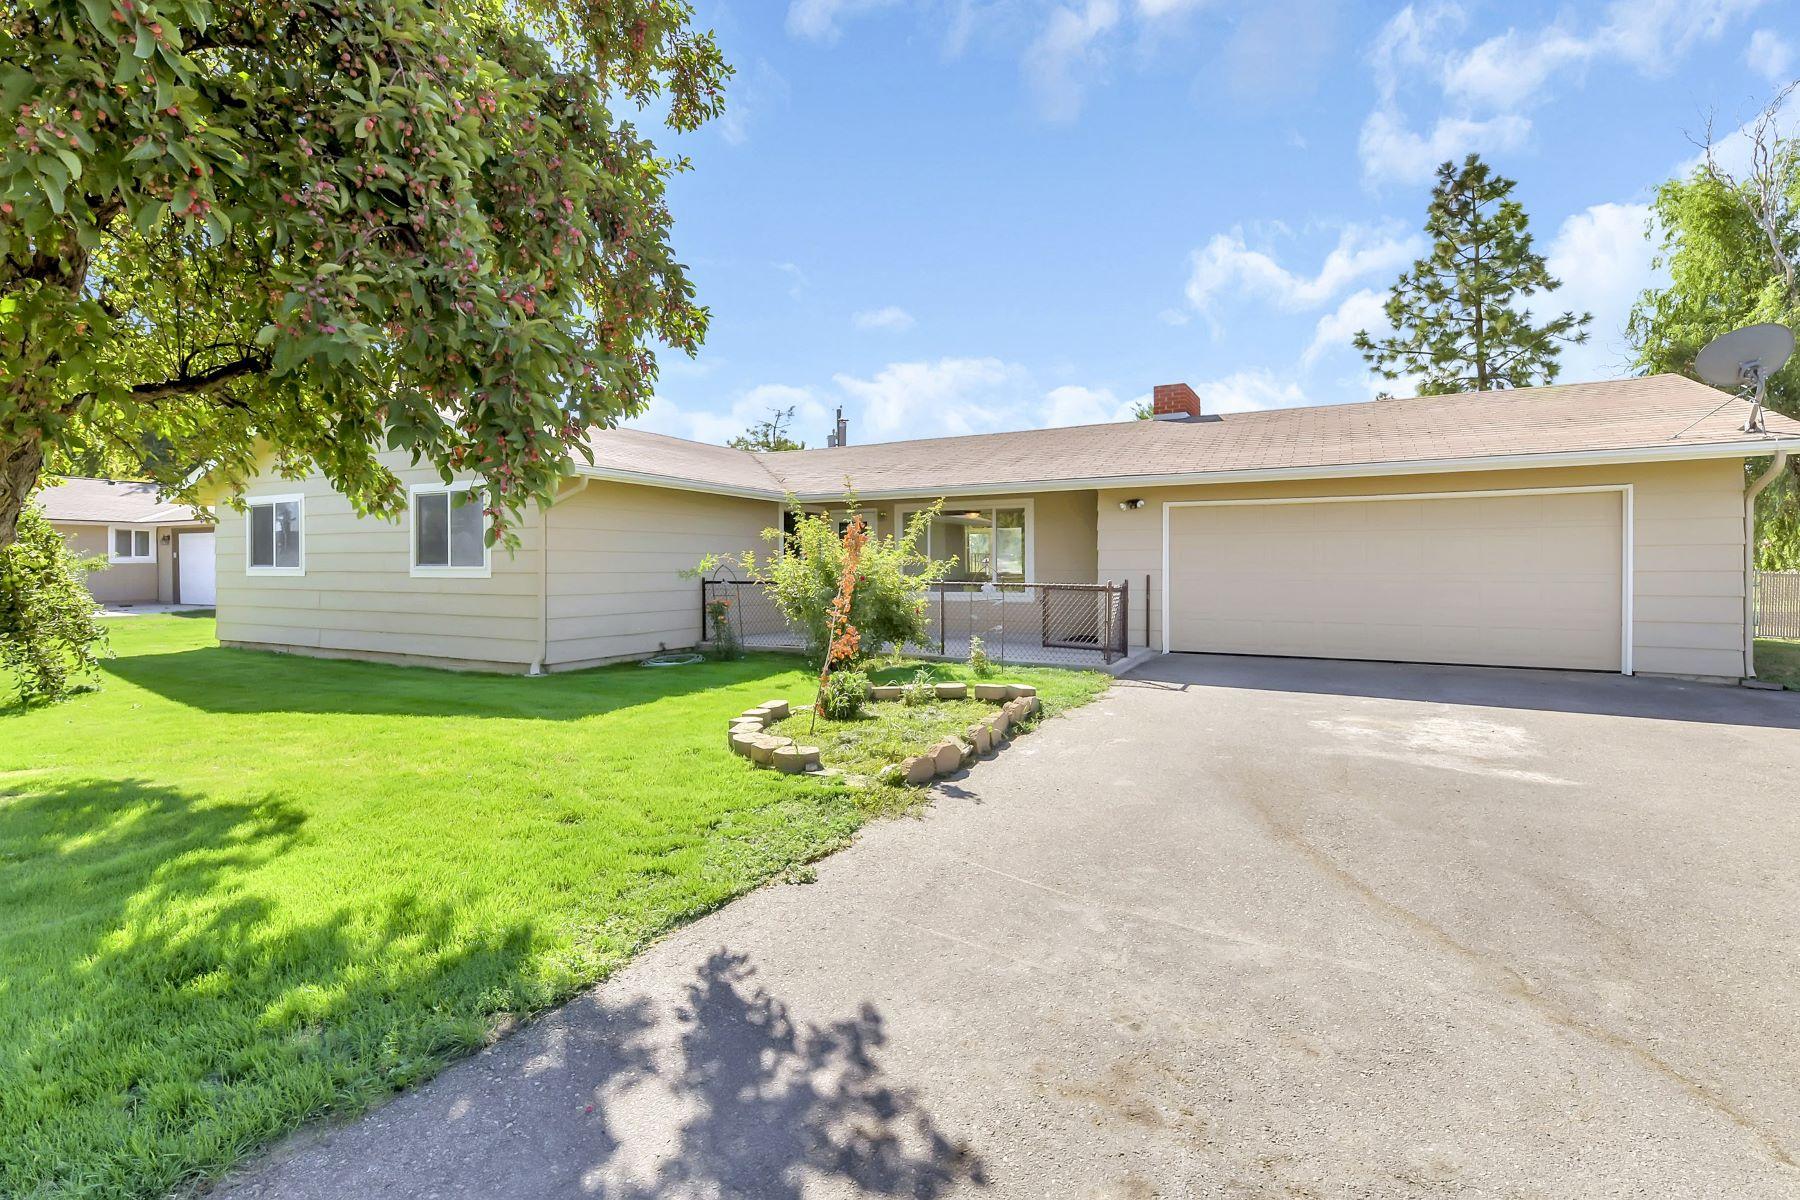 Single Family Homes for Sale at 1985 Waltman Street, Meridian 1985 W Waltman St Meridian, Idaho 83642 United States